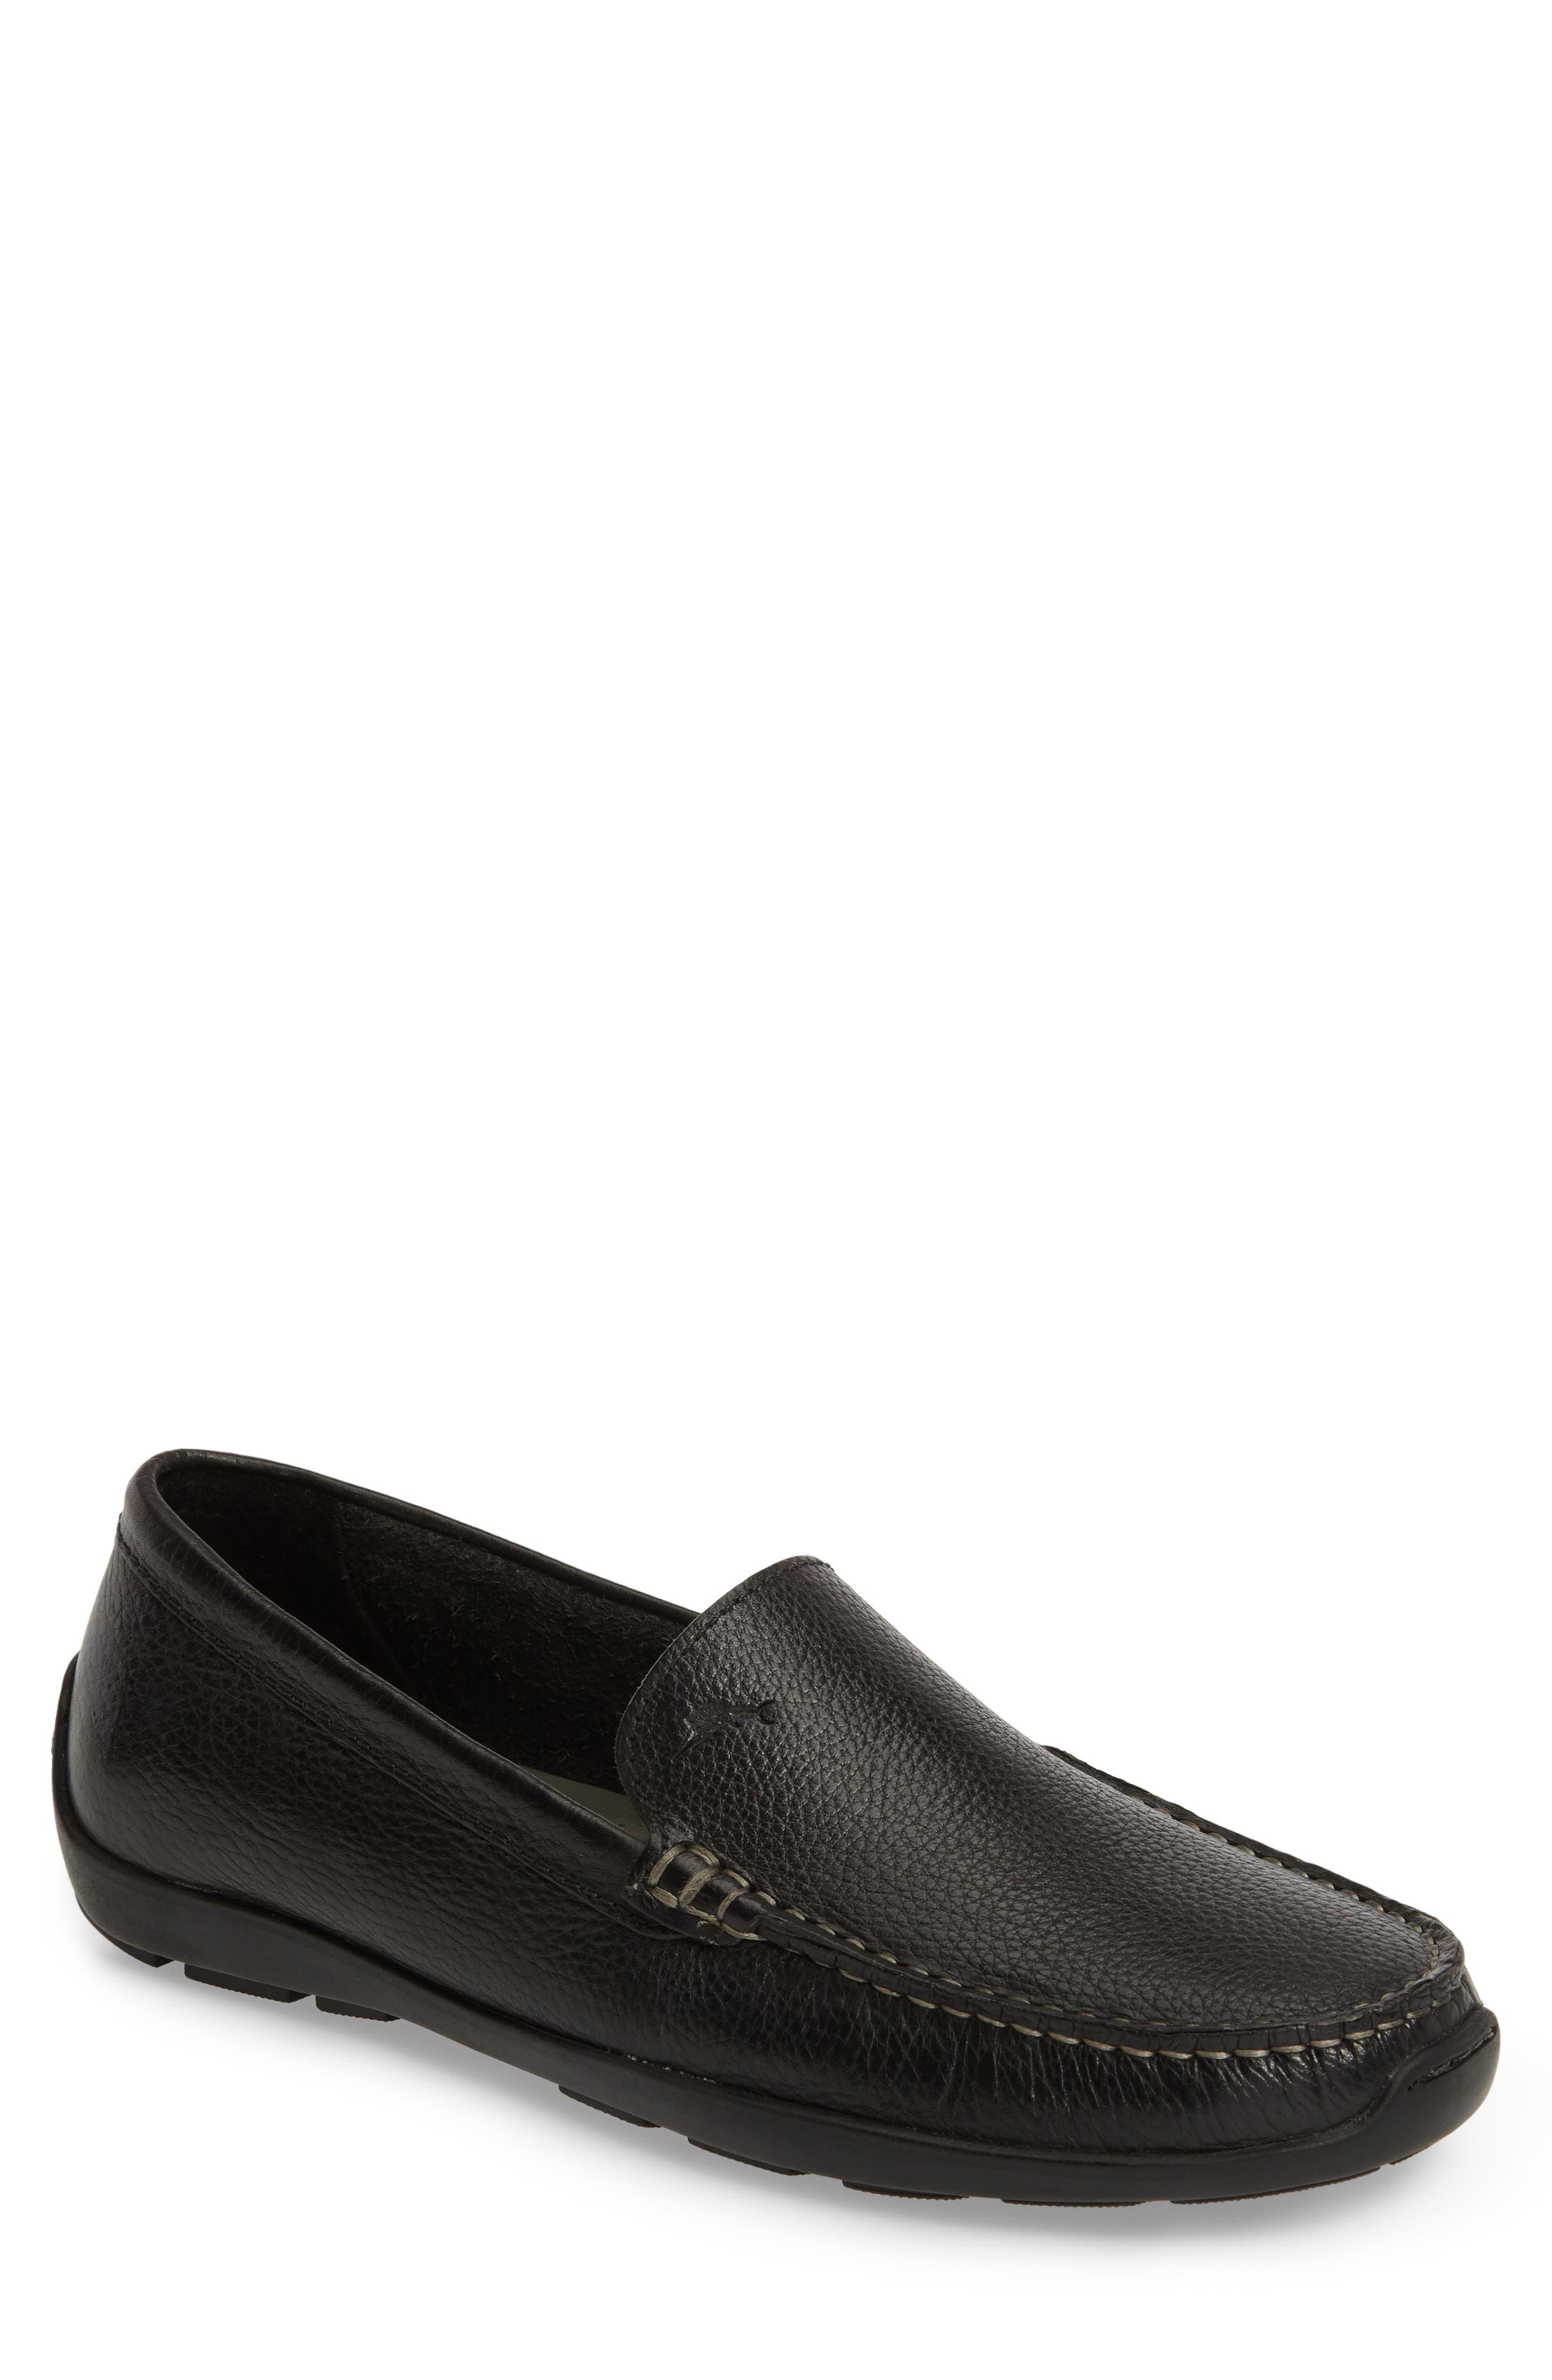 Orion Venetian Loafer,                             Main thumbnail 1, color,                             Black Leather